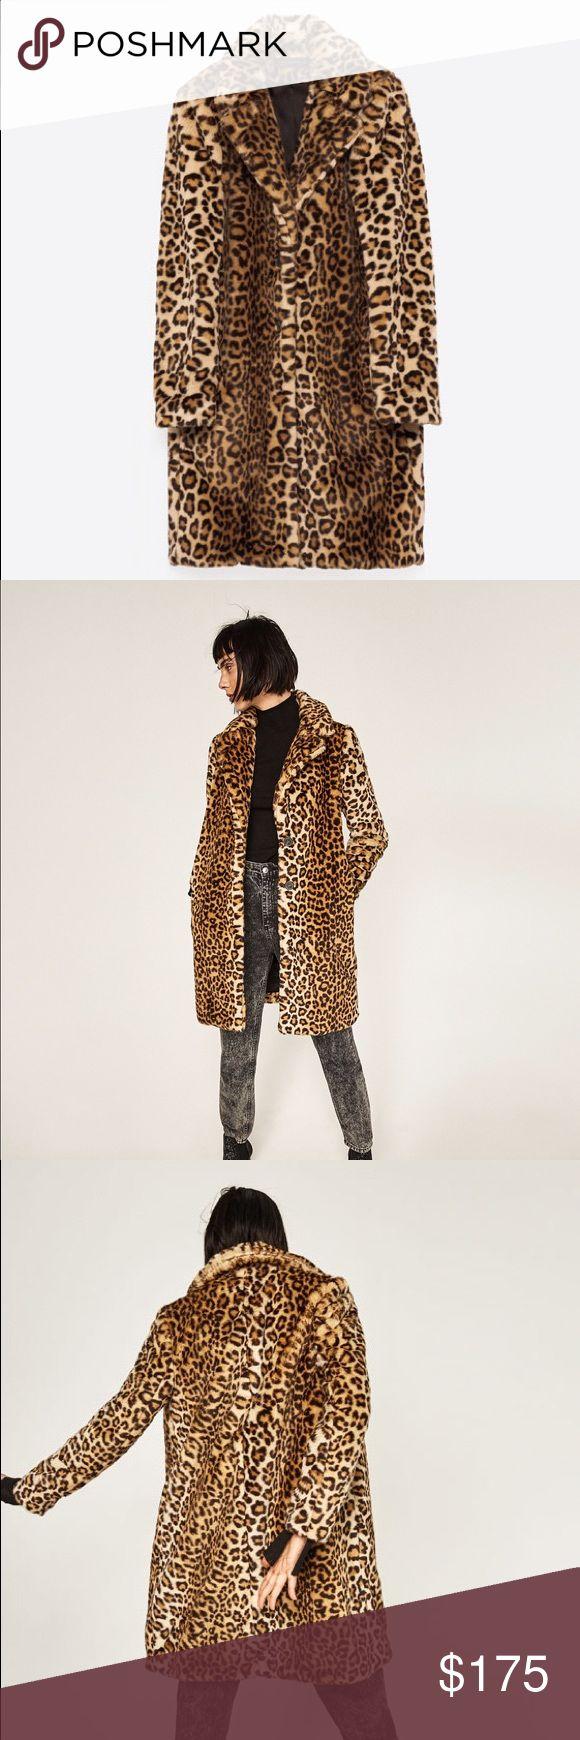 Zara parka leopard print lining